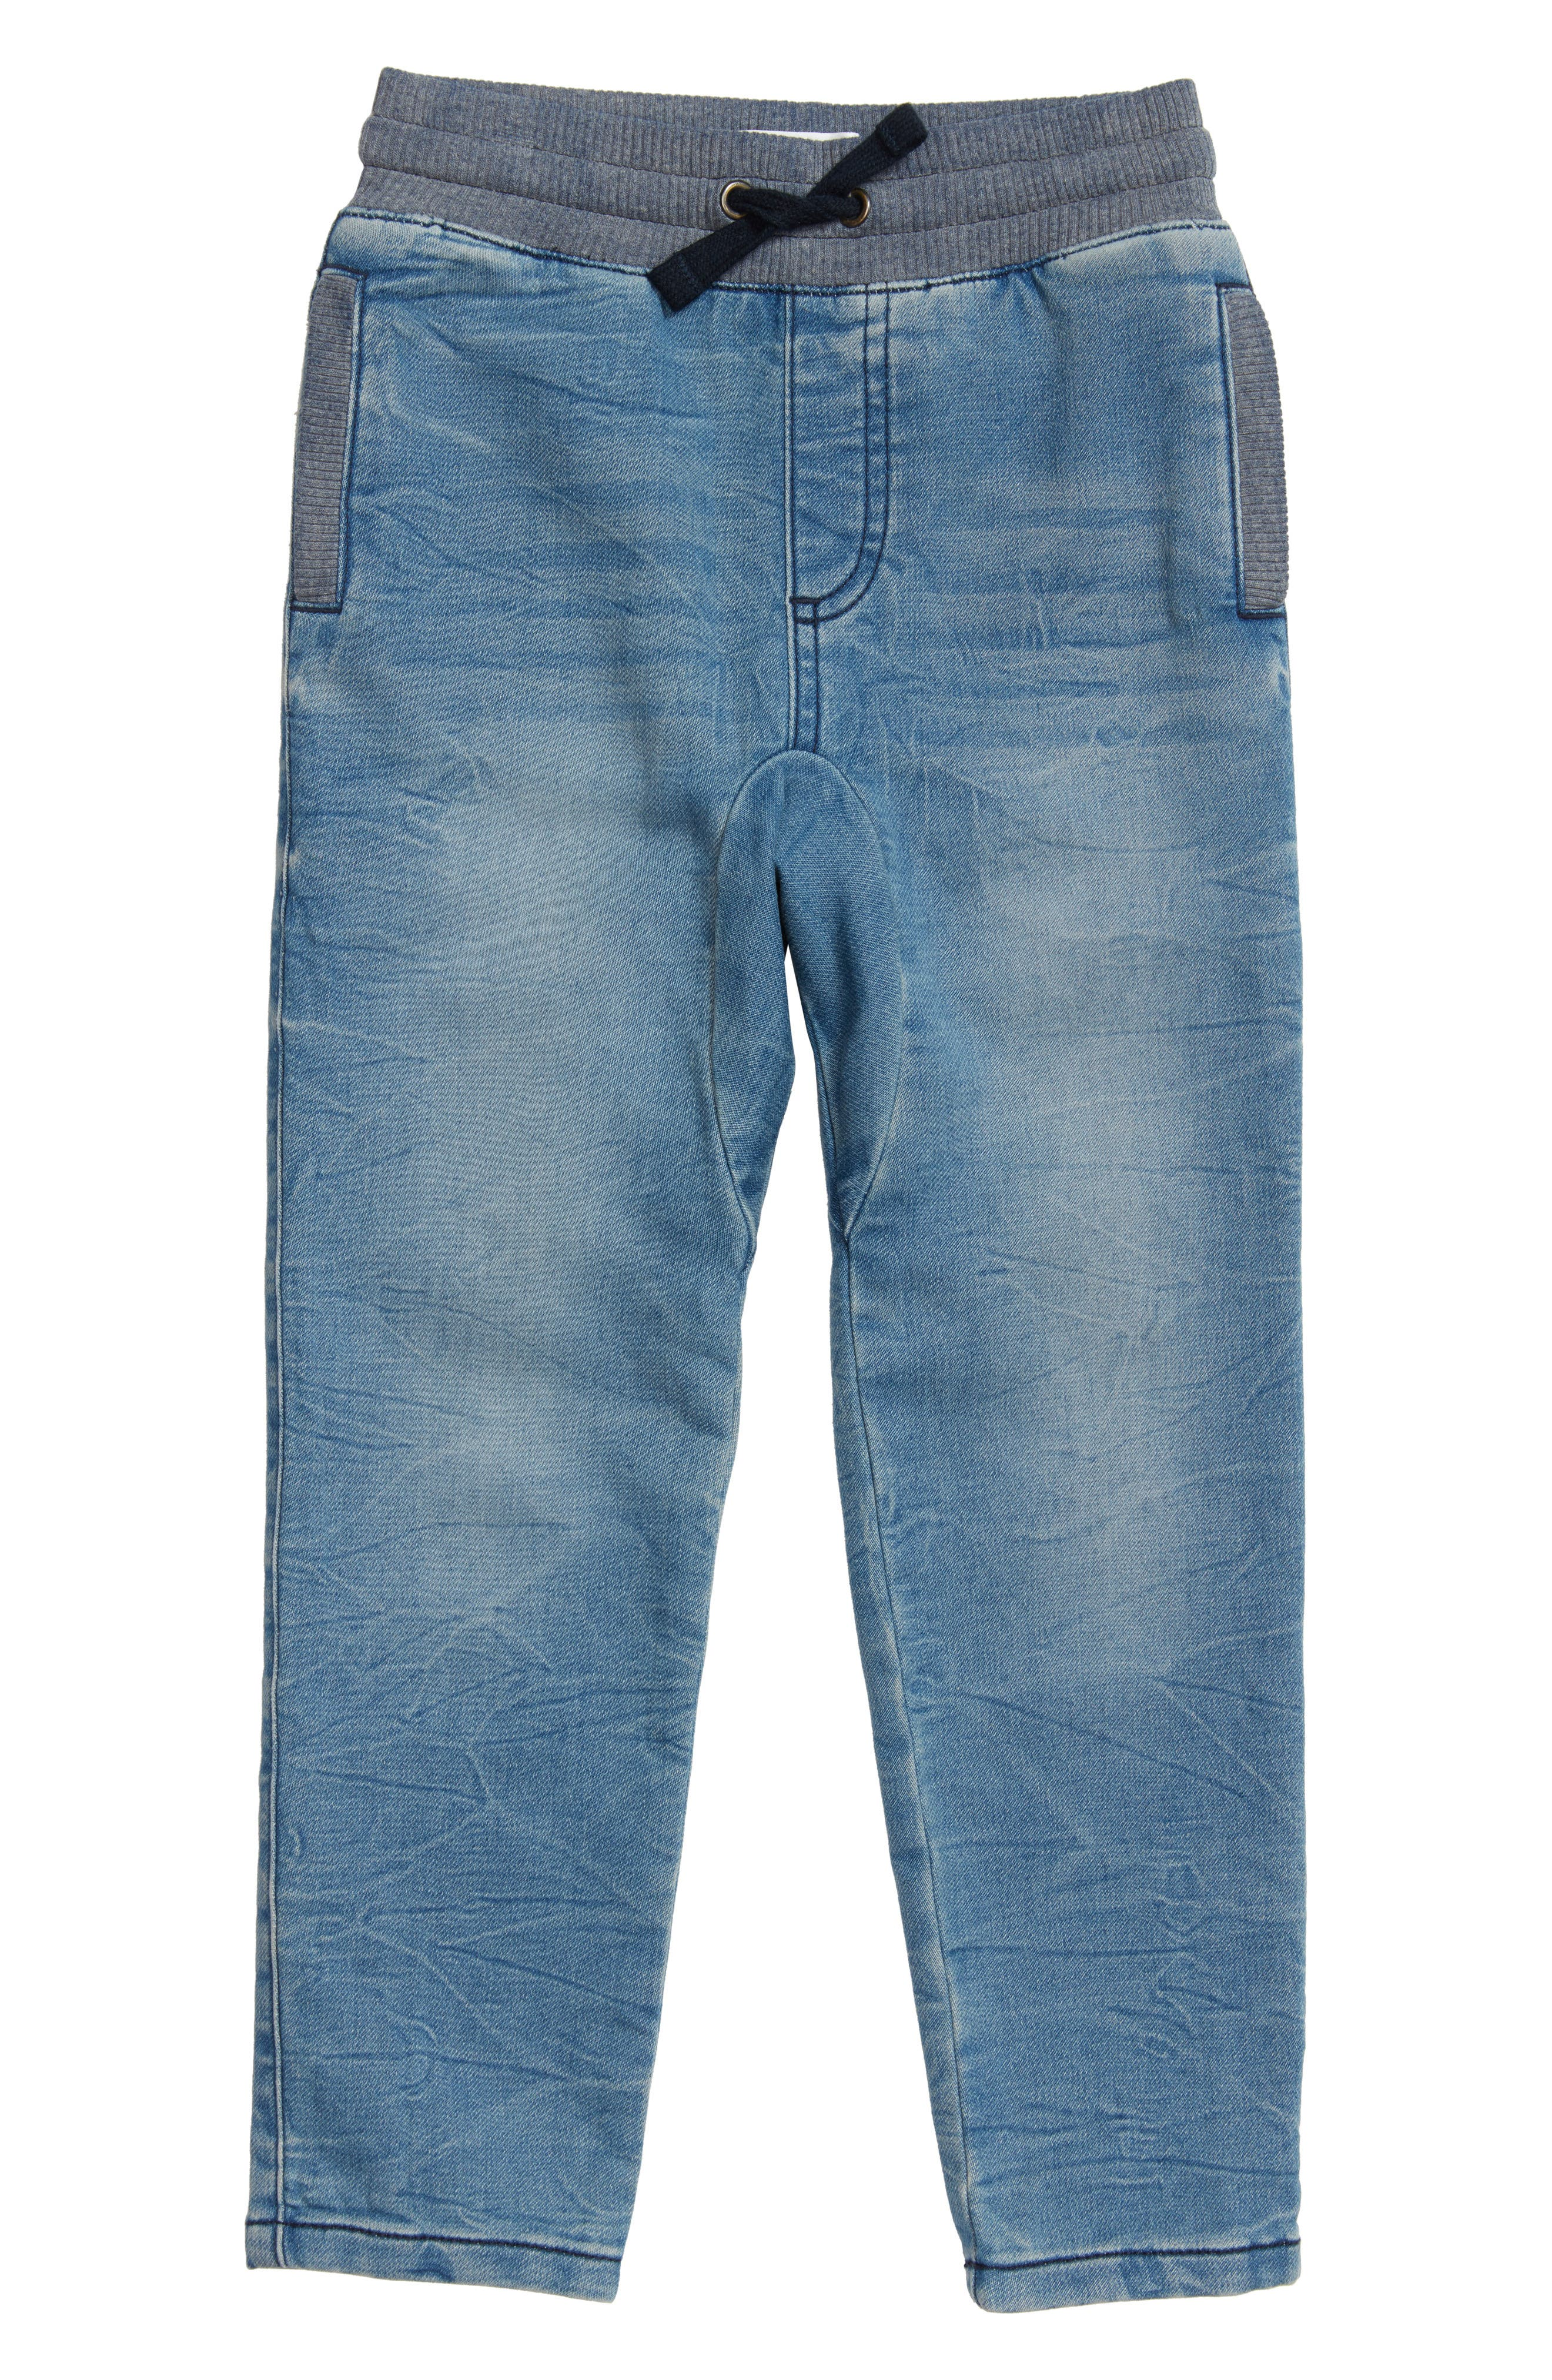 Denim Sweatpants,                         Main,                         color, Electric Wash